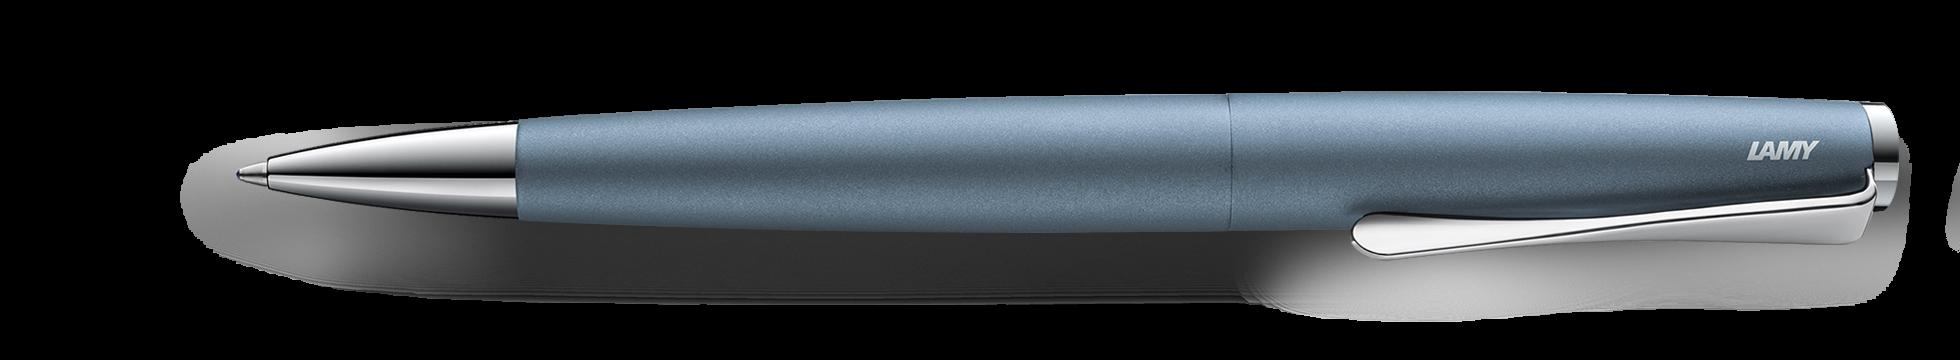 LAMY studio limited edition glacier Ballpoint pen